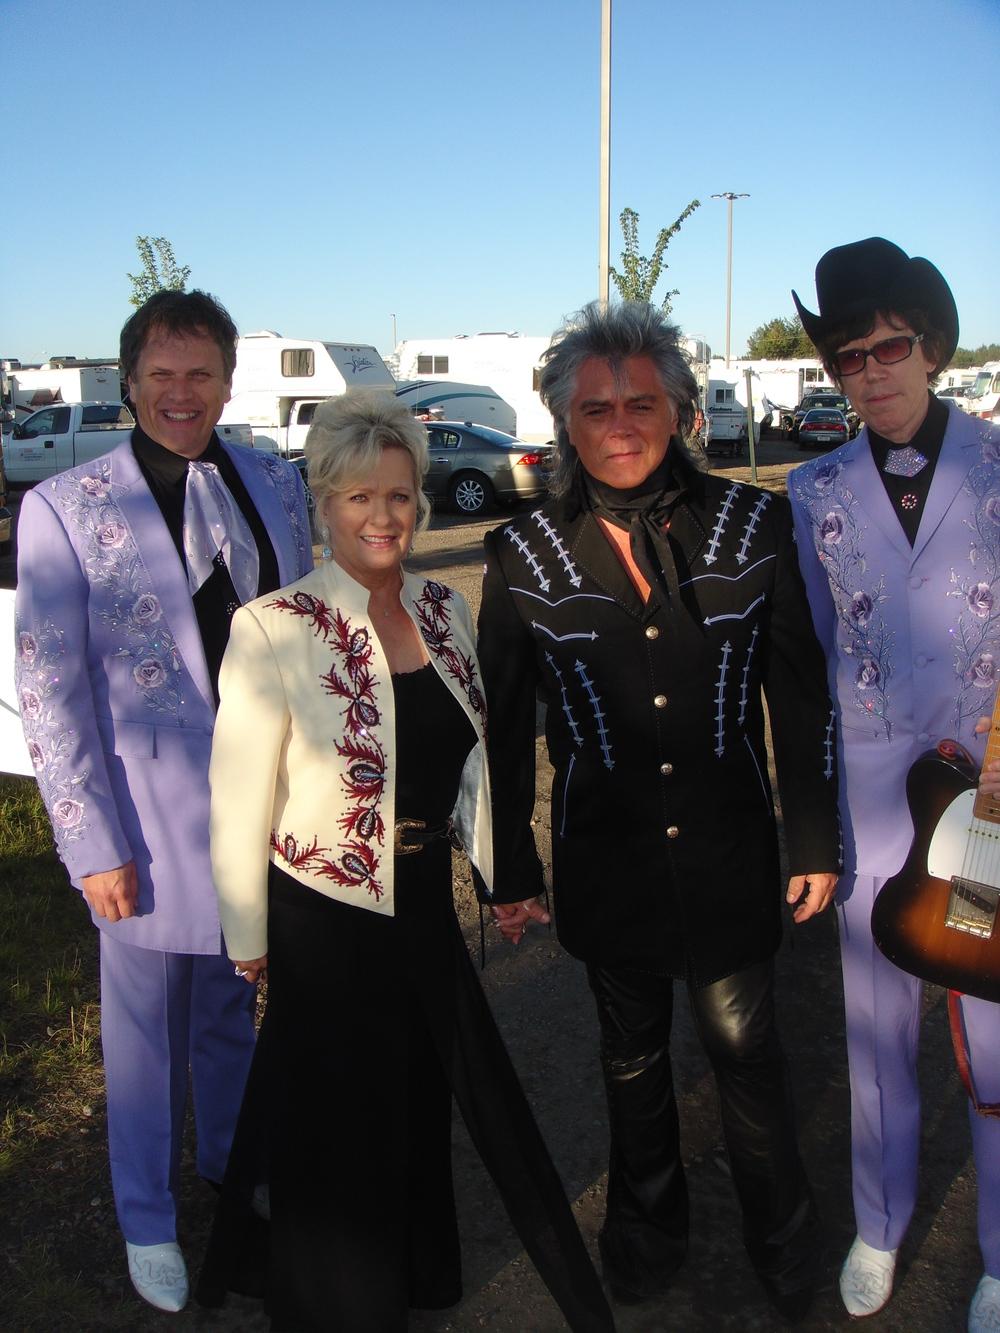 2011 - Paul Martin, Connie Smith, Marty Stuart & Kenny Vaughn